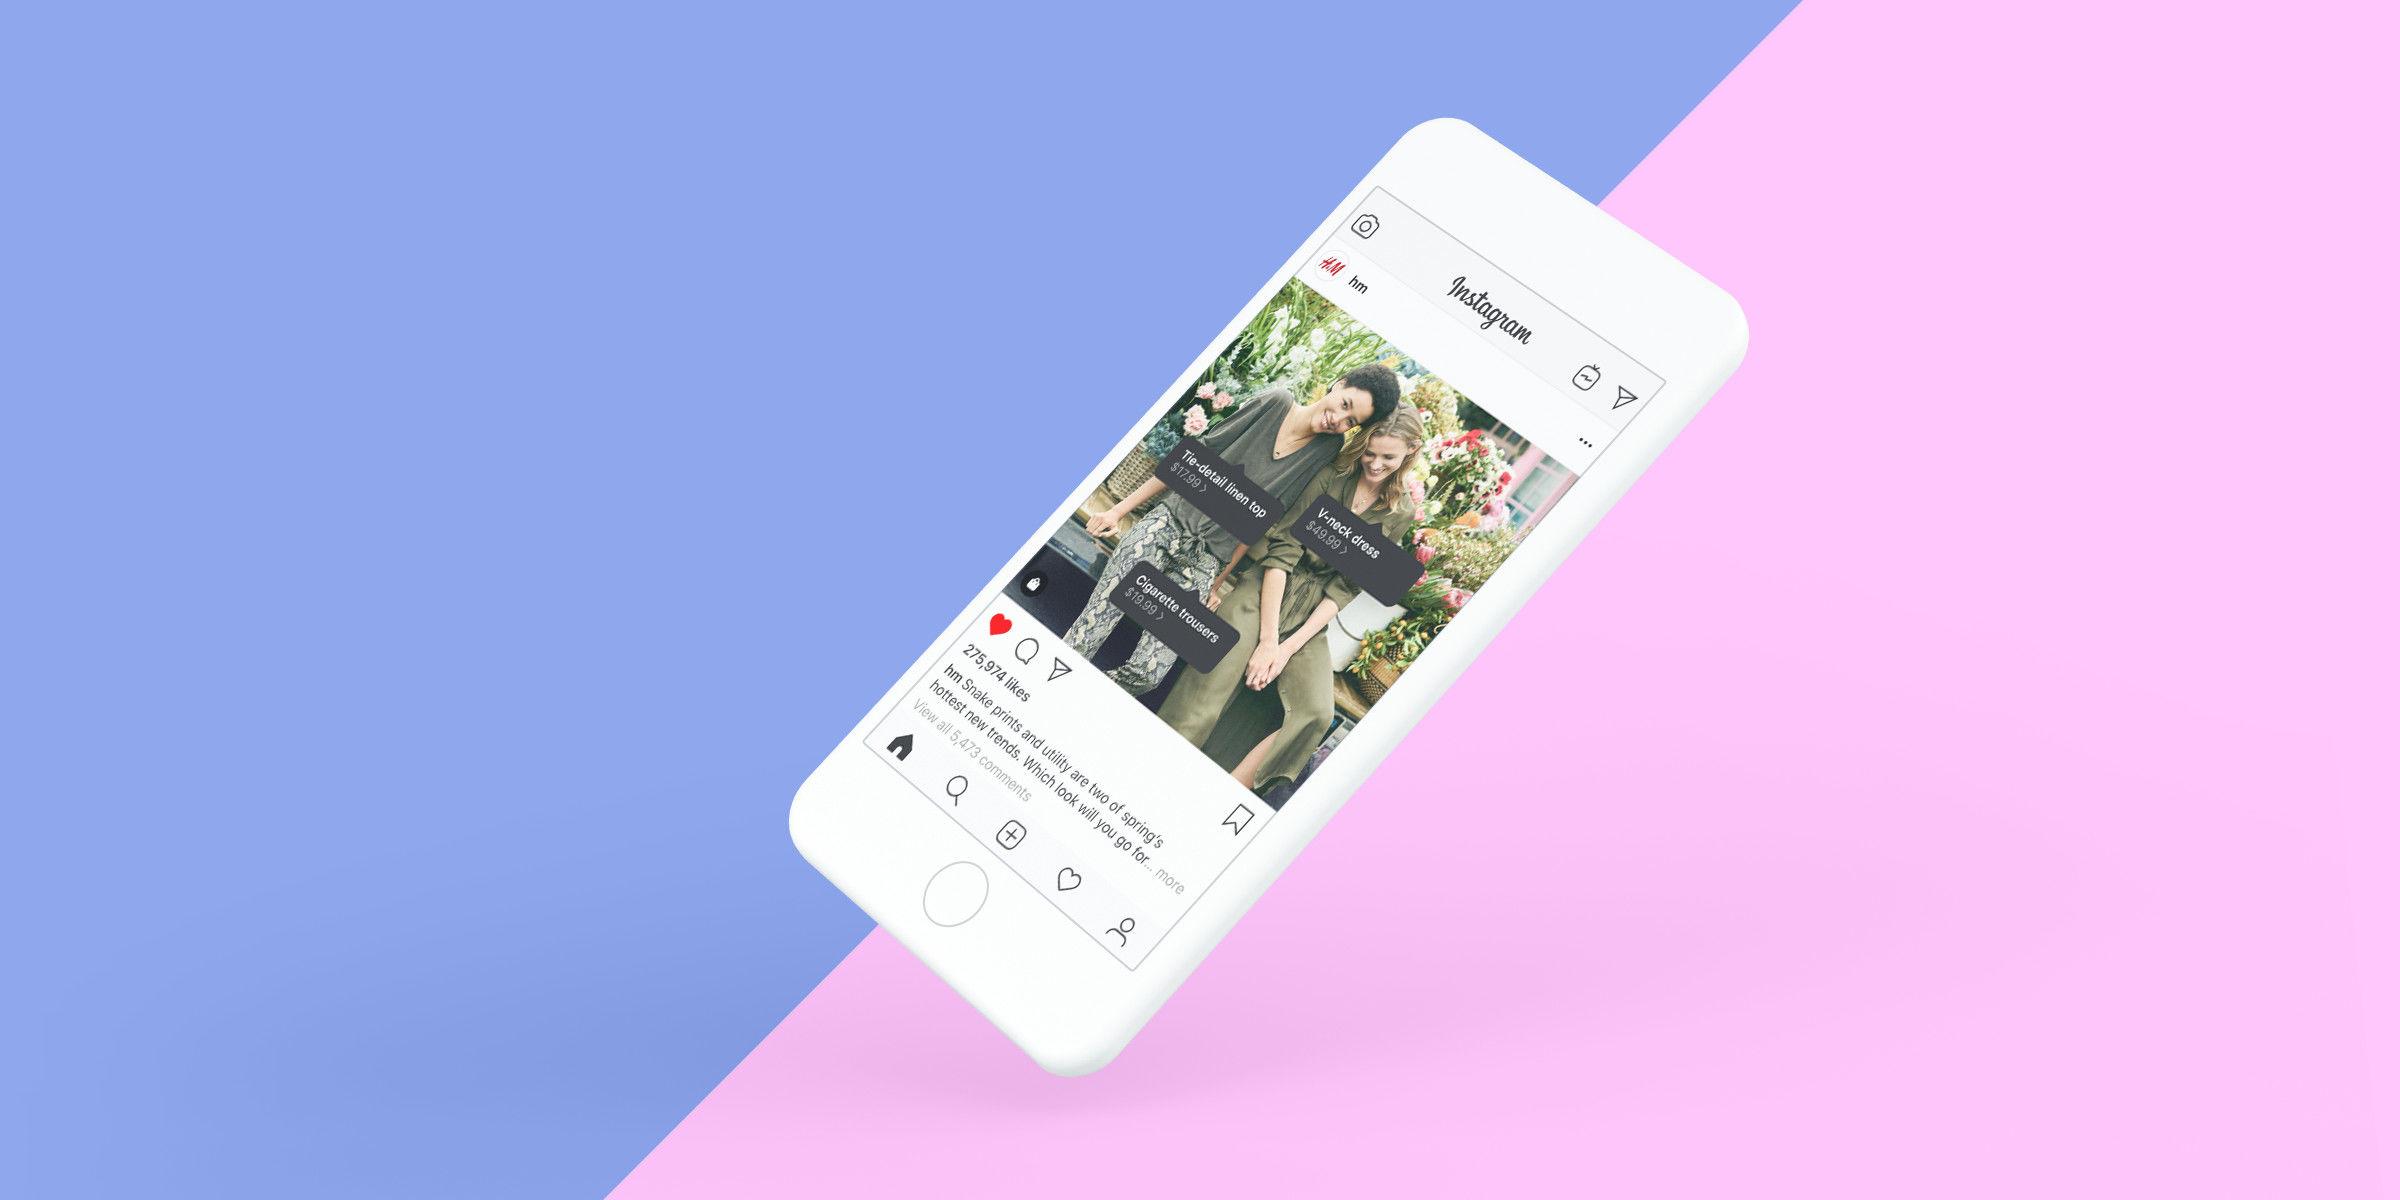 Instagram 除了產品標註更推出購物按鈕checkout-鯊客科技SEO網頁設計公司